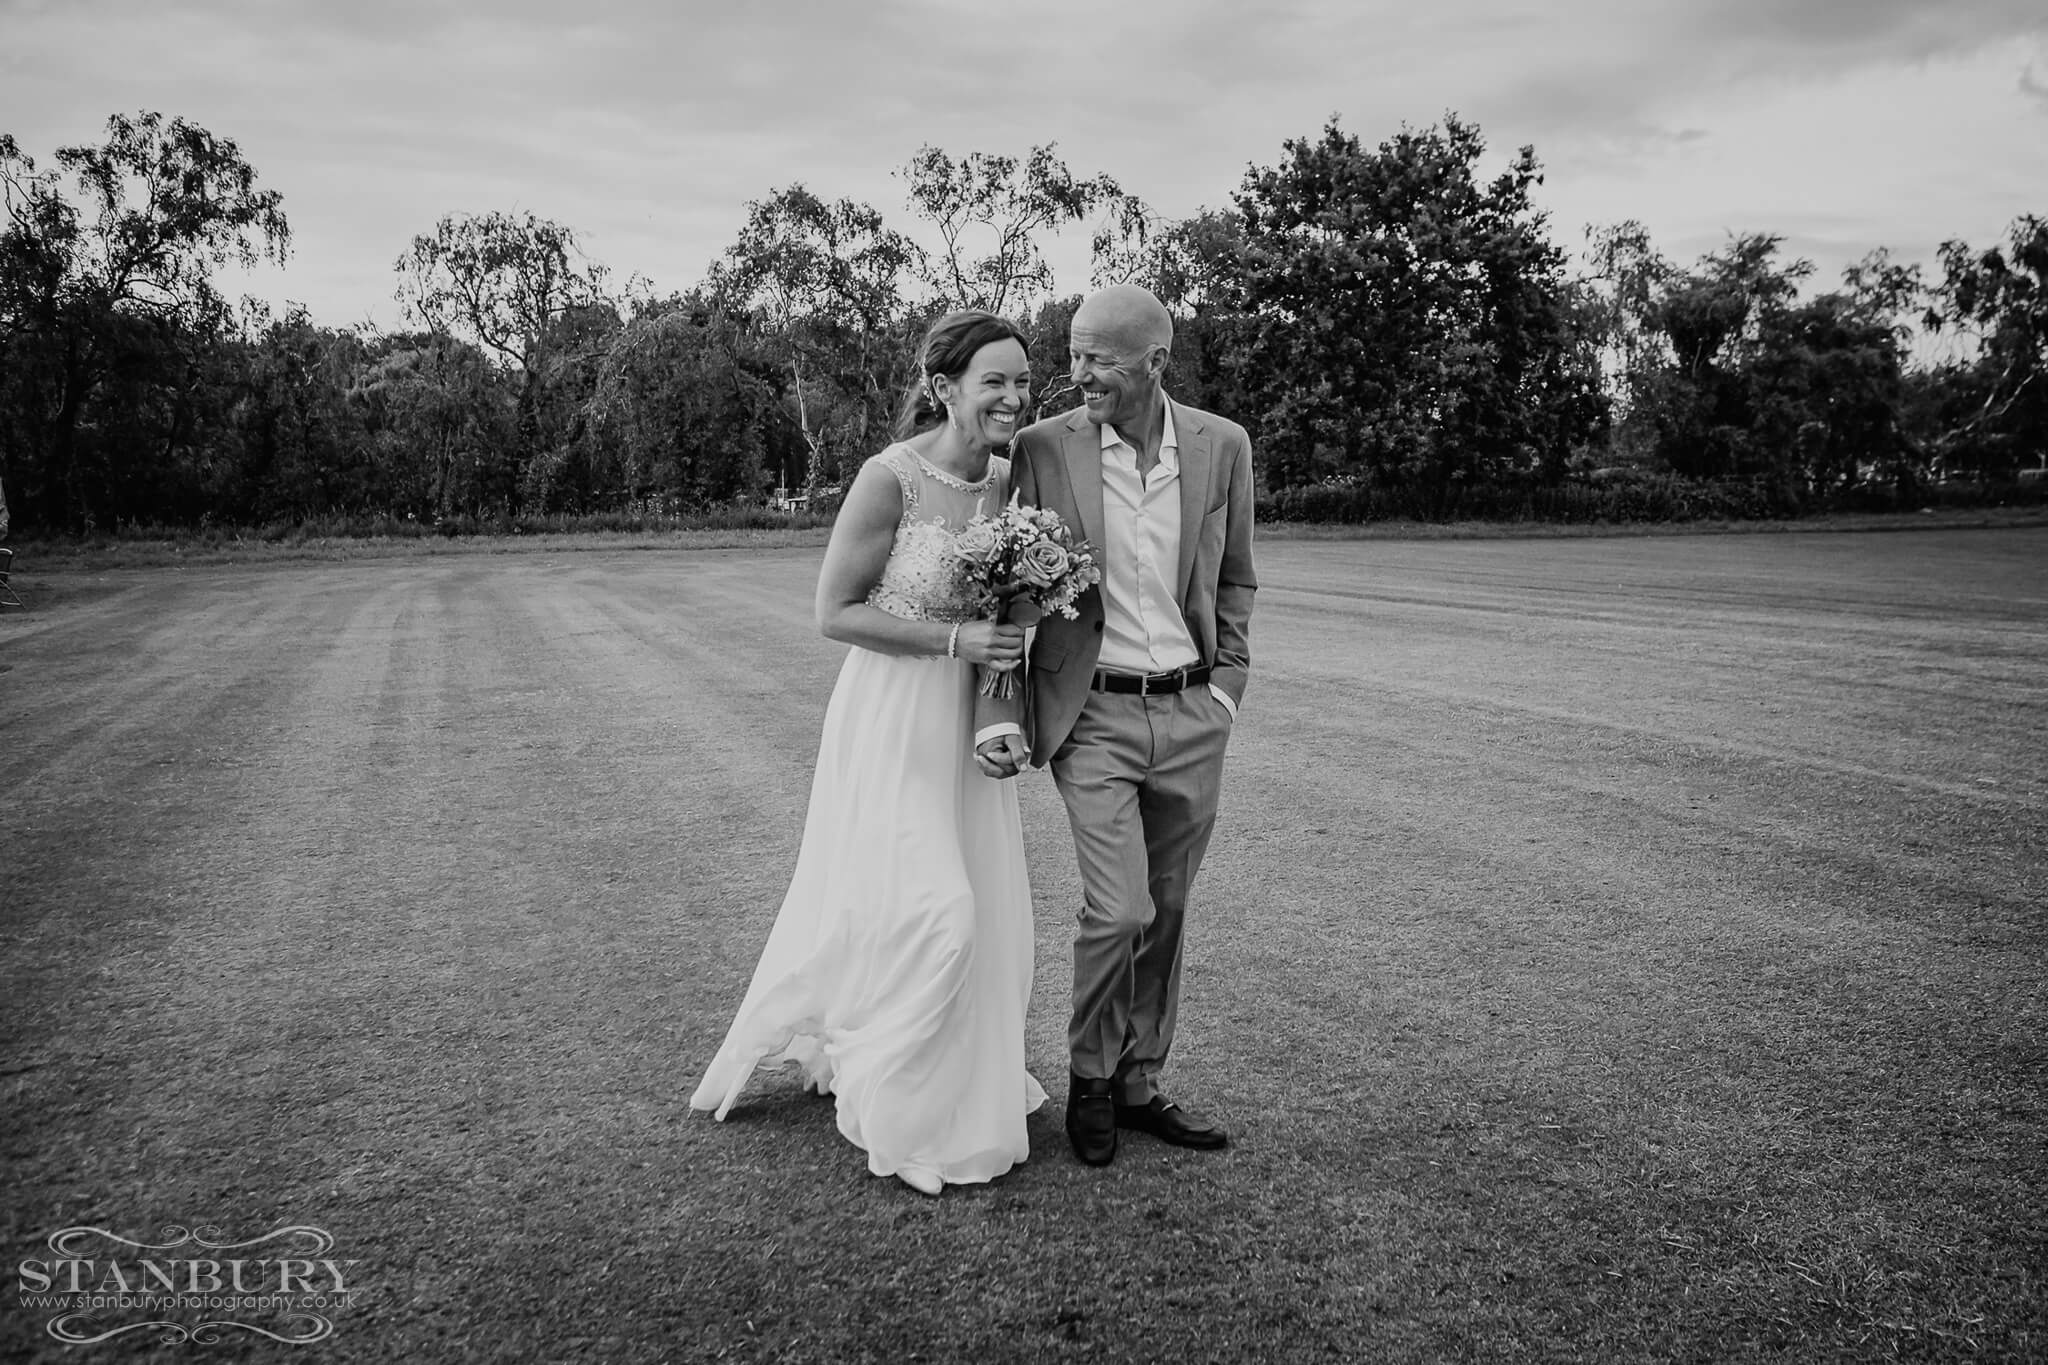 tipi-festival-bride-groom-wedding-photography-lancashire-stanbury-005